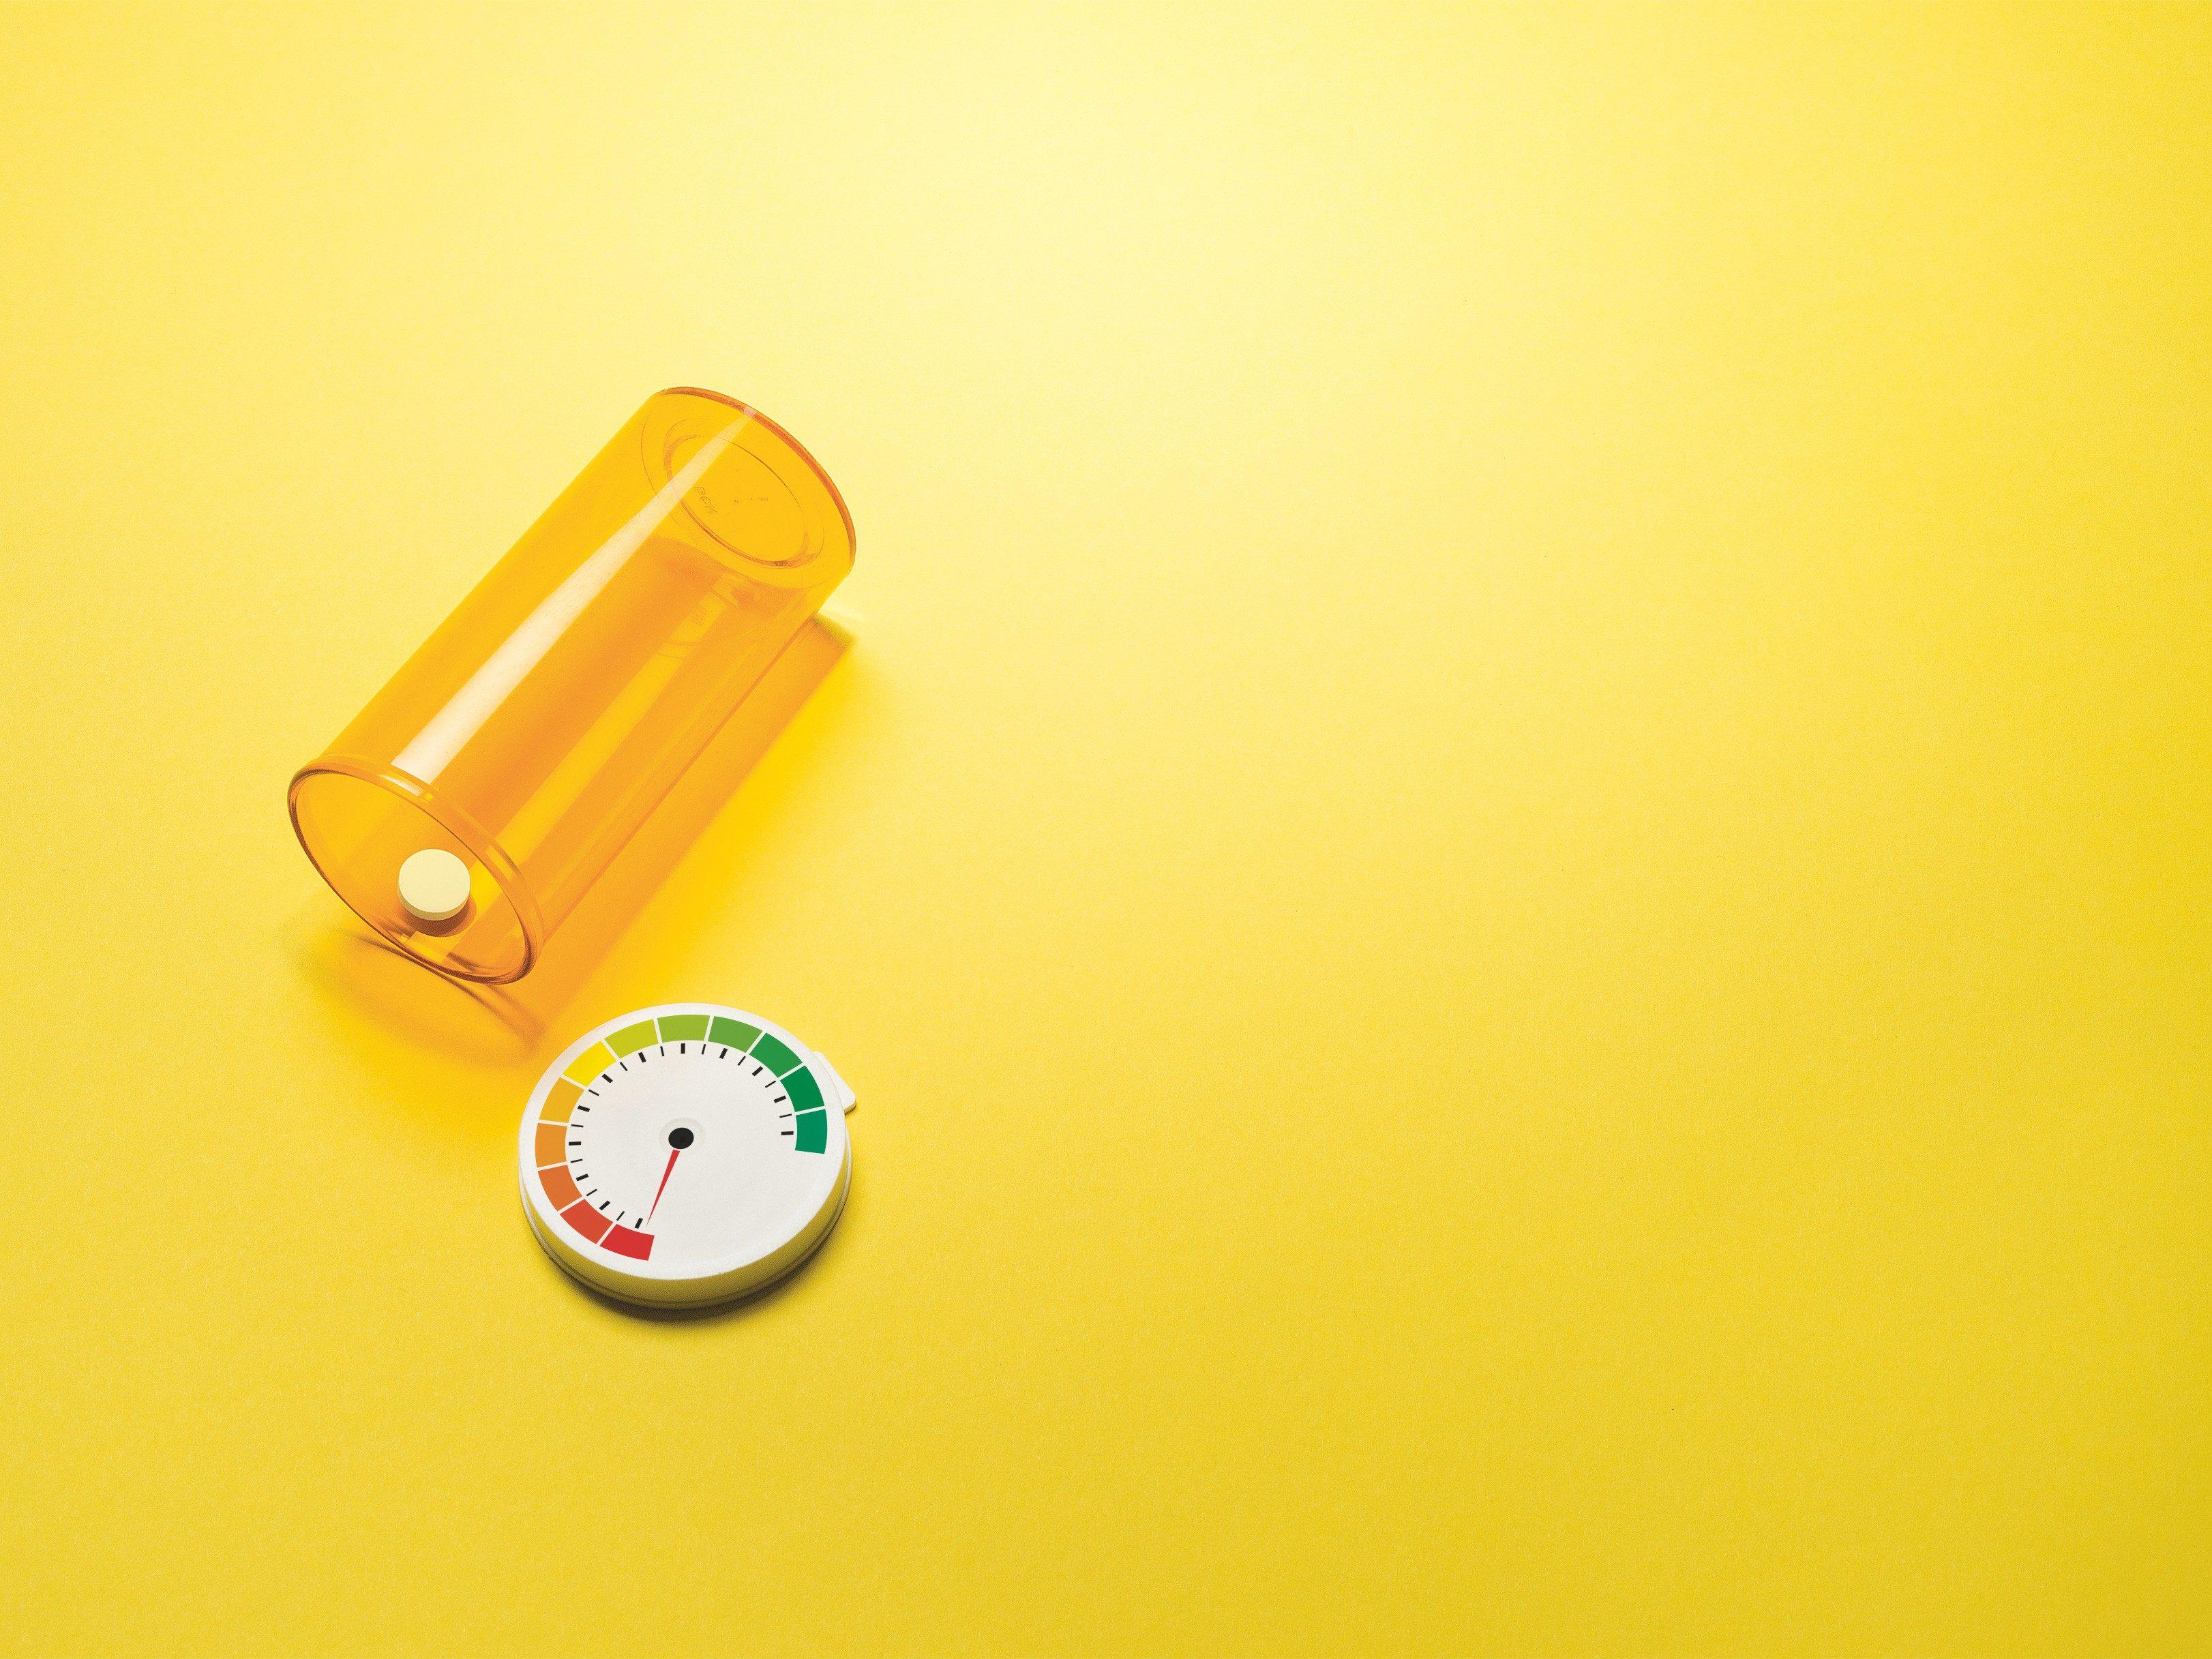 Investigating Canada's Drug Scarcity